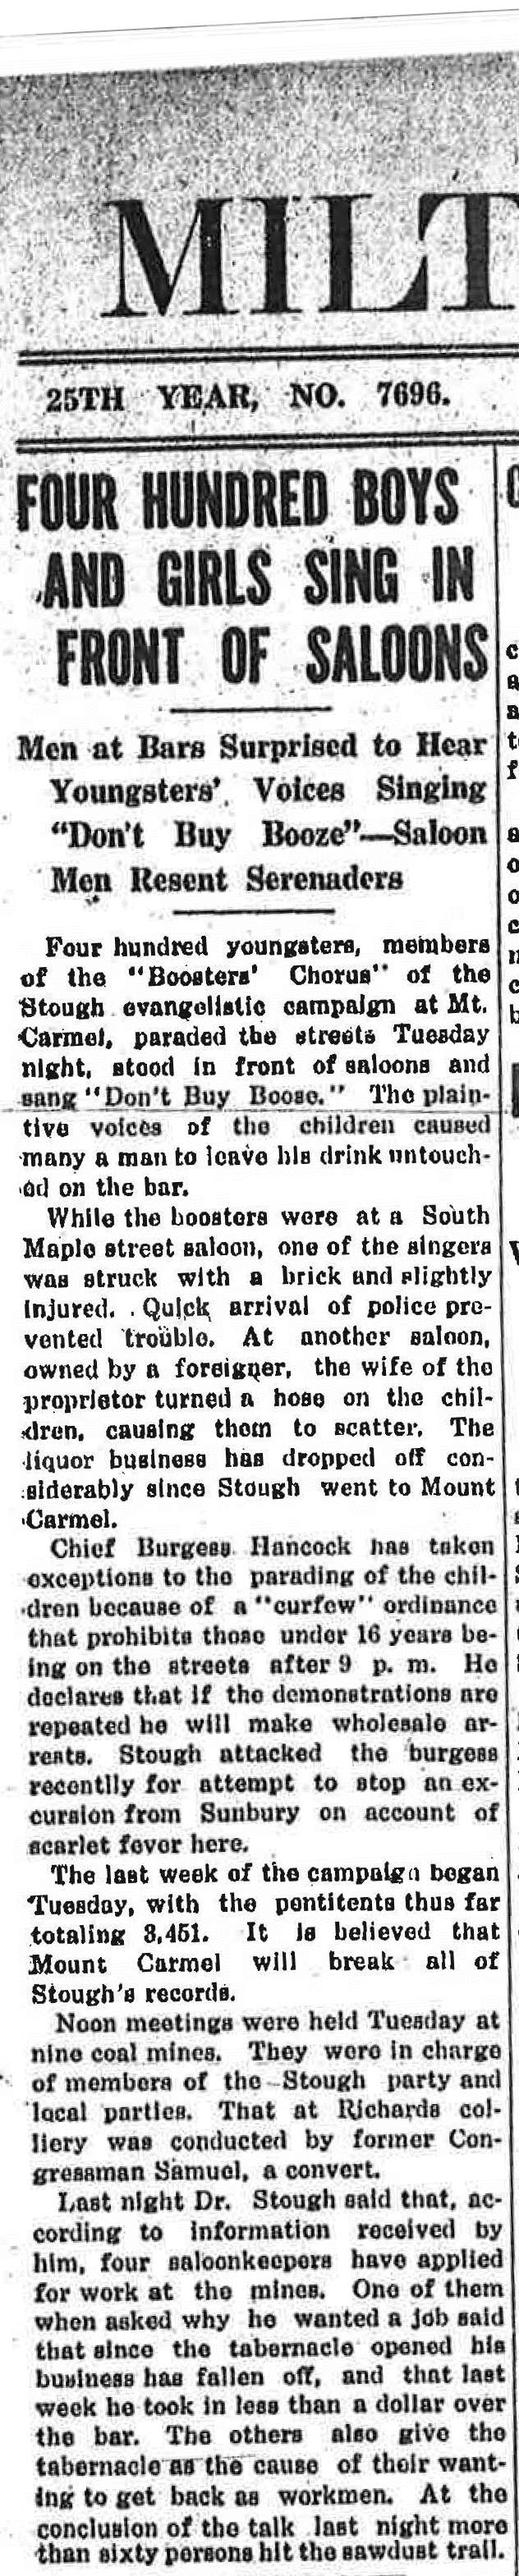 Milton Evening Standard (April 9, 1914)